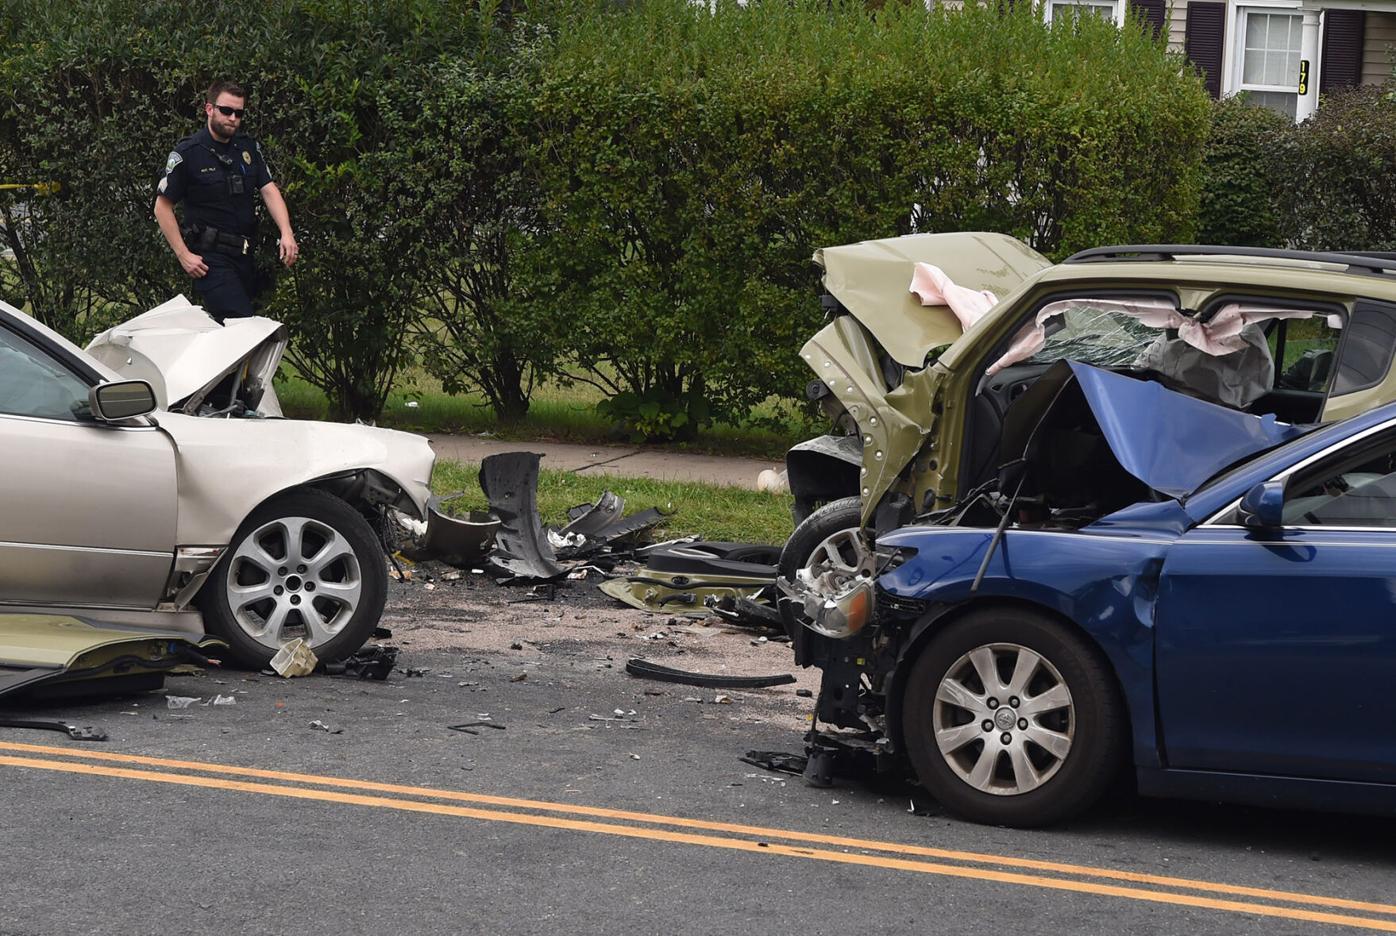 091421 MA Multi-Car Accident 02.jpg